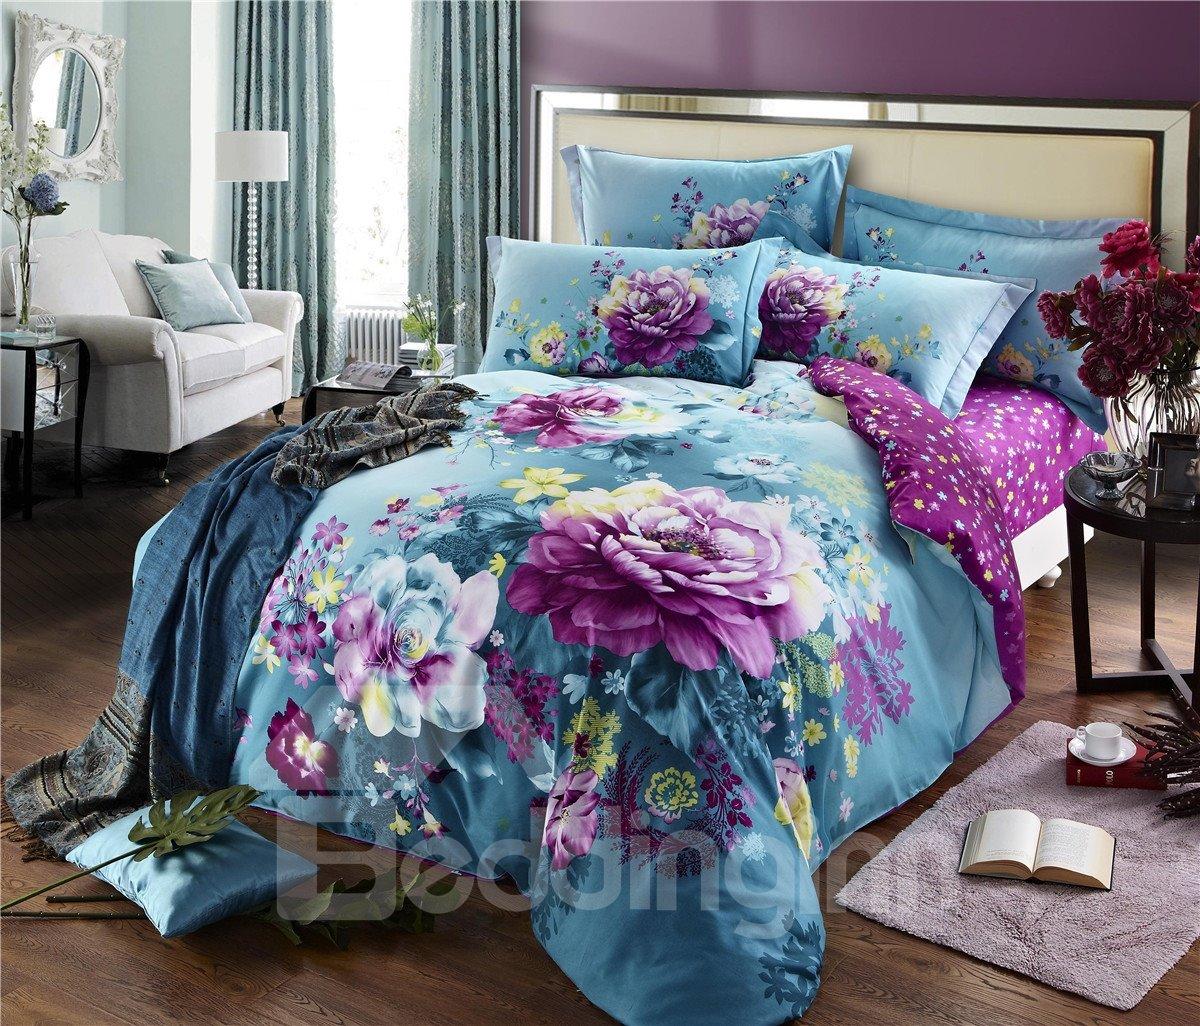 Purple Flower With Blue Background Cotton 4 Piece Duvet